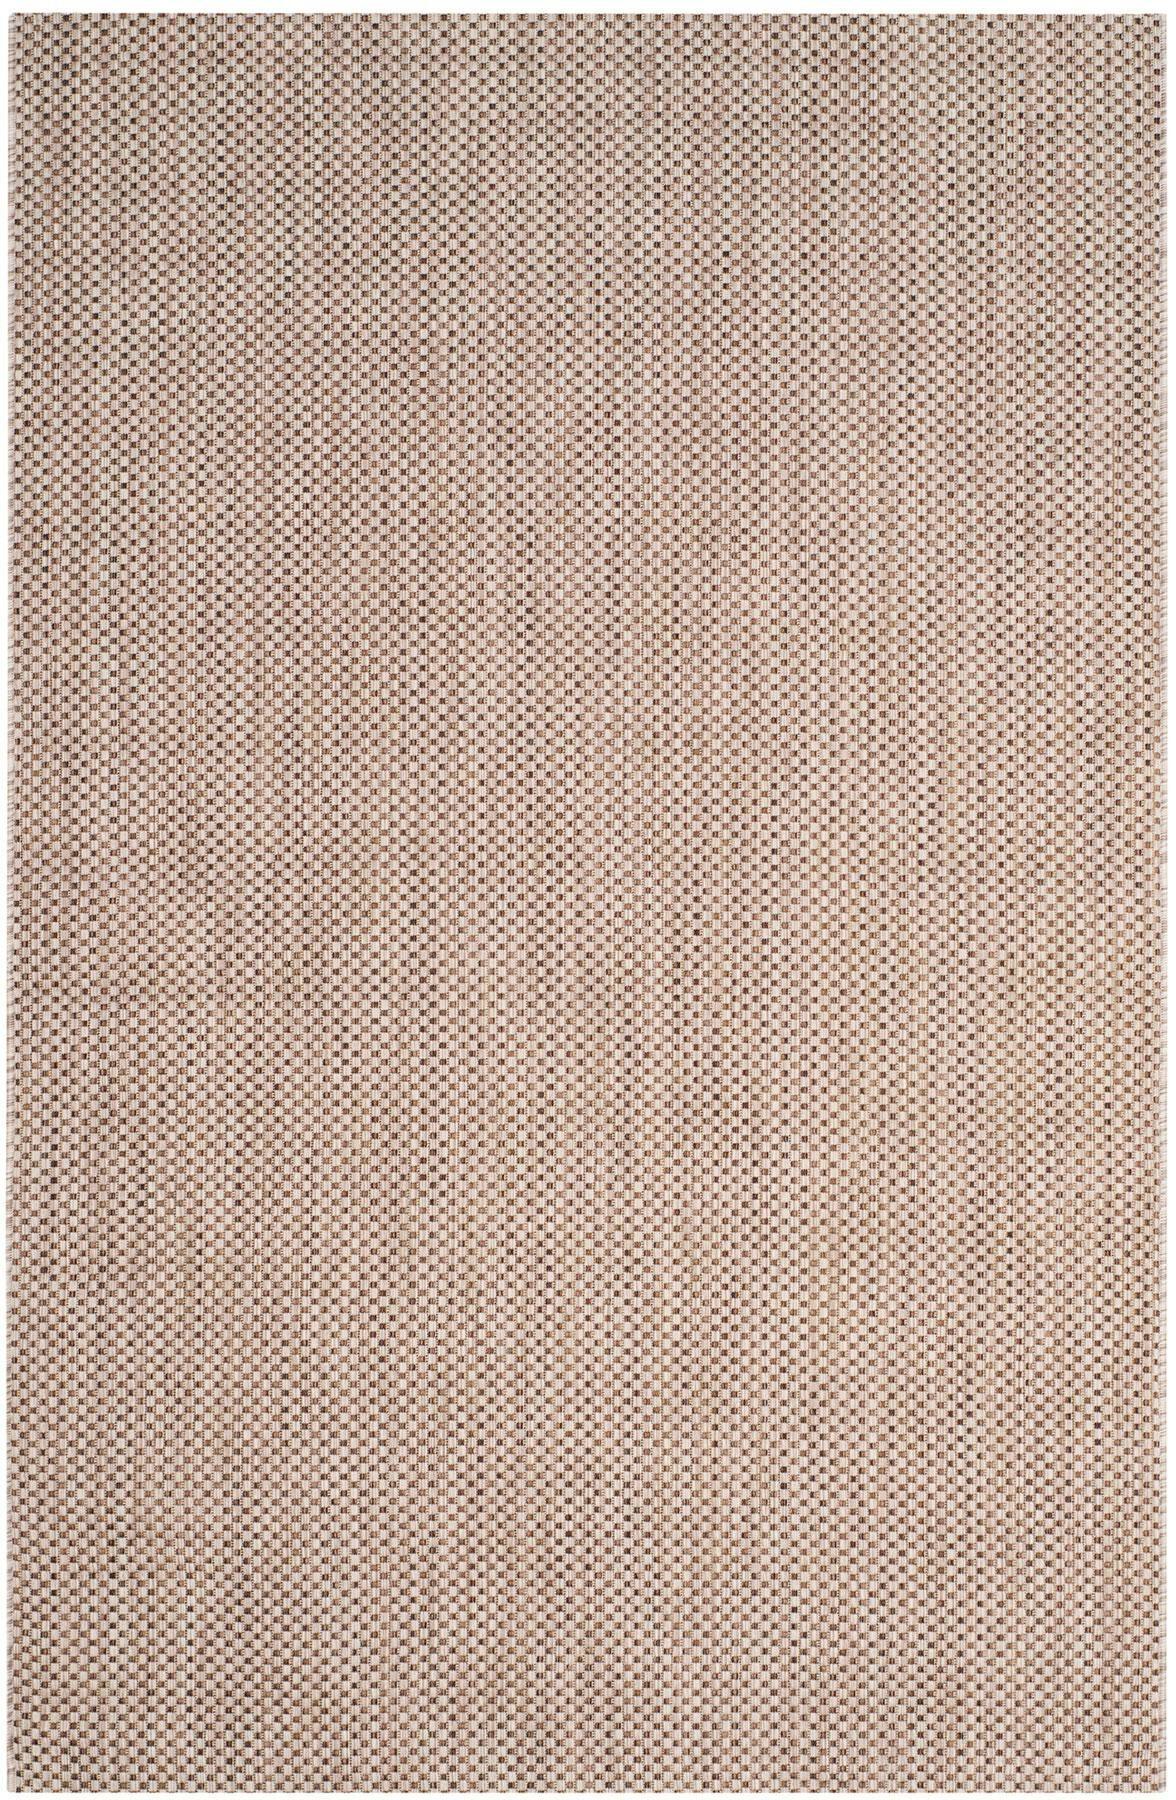 Mullen Beige/Brown Area Rug Rug Size: Rectangle 5'3